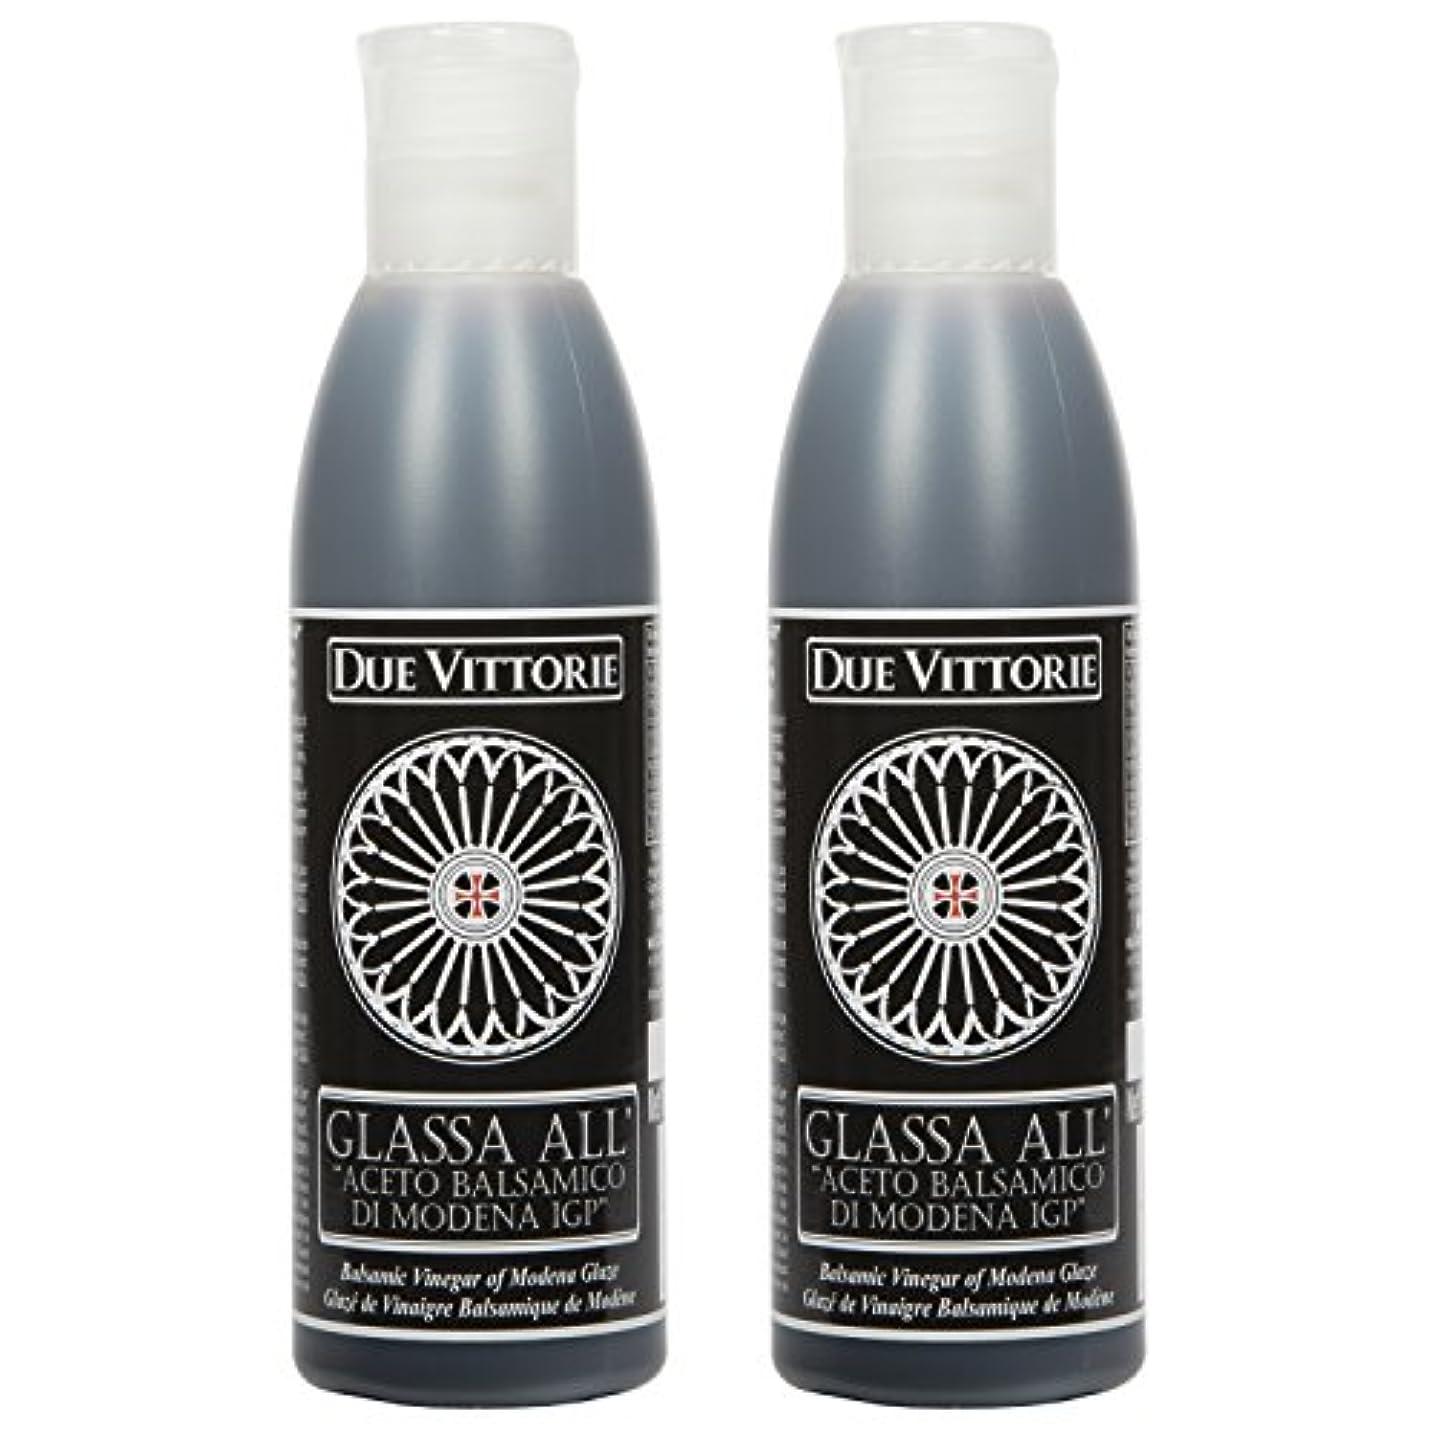 Due Vittorie Italian Balsamic Glaze Crema All Aceto Balsamico Di Modena I.G.P. Gluten Free Balsamic reduction 8.45 oz bottle (2 pack) oplwhvchw